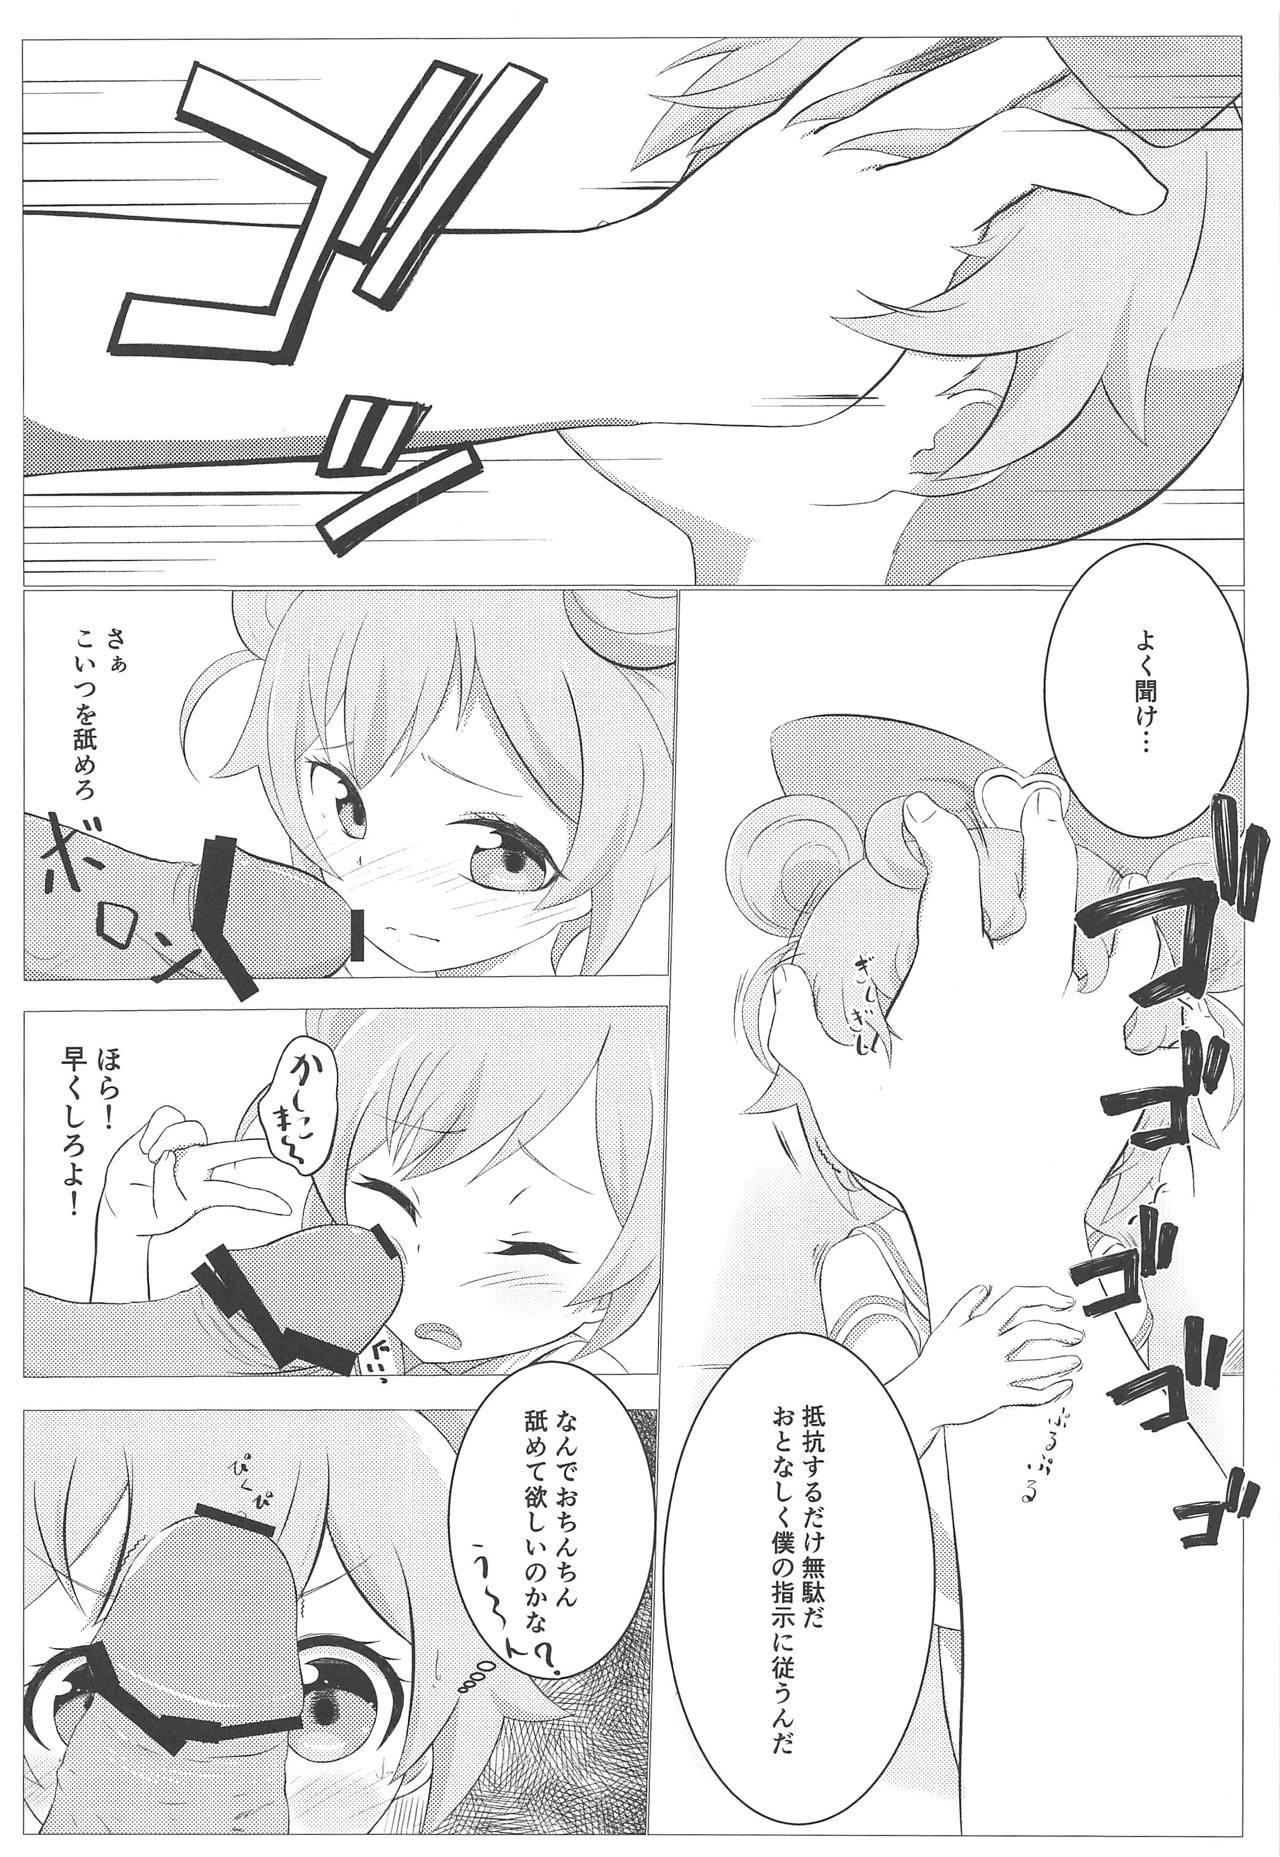 Kami Idol Rachitte Mita! 2